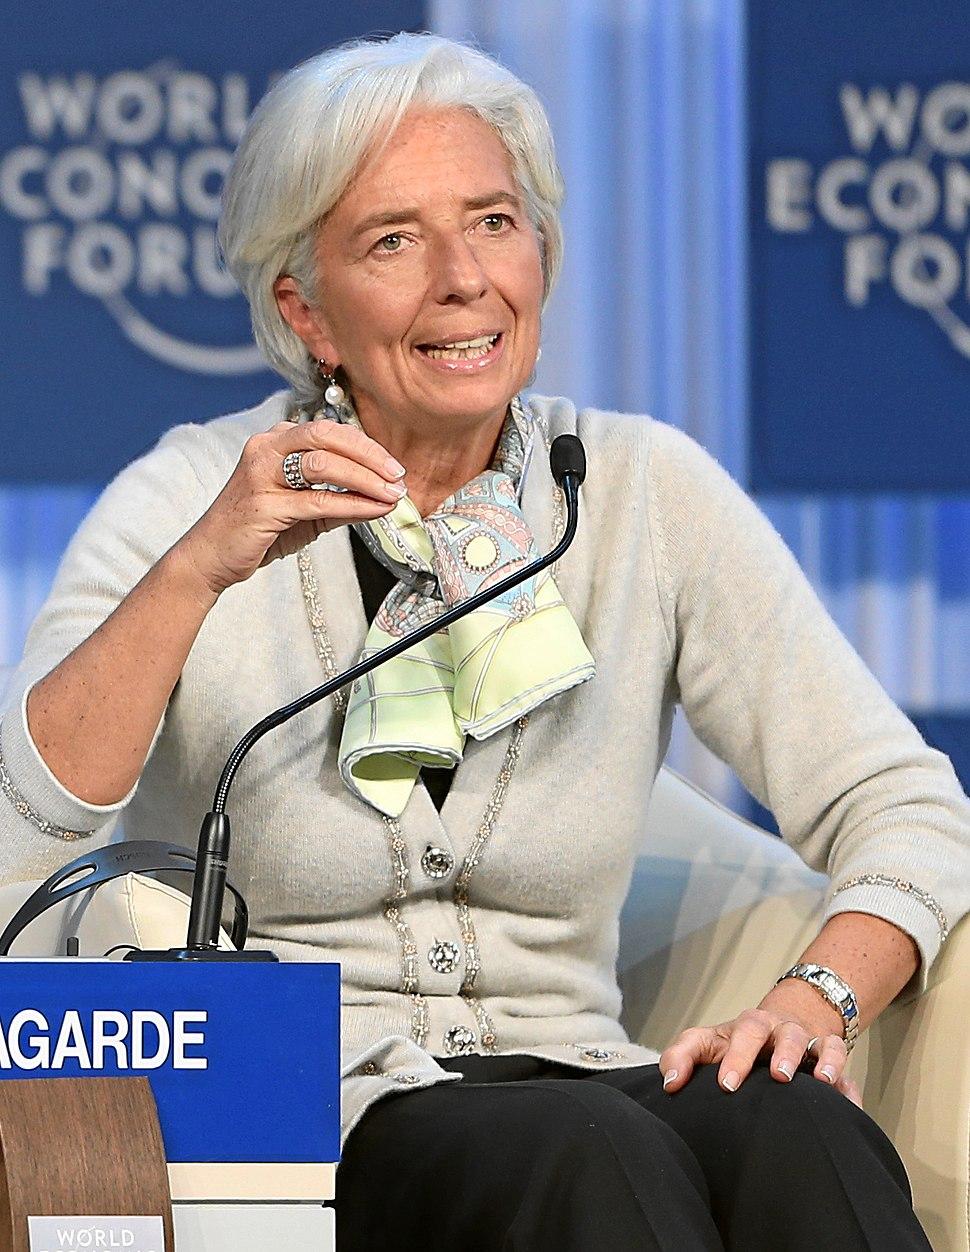 Christine Lagarde World Economic Forum 2013 (cropped)